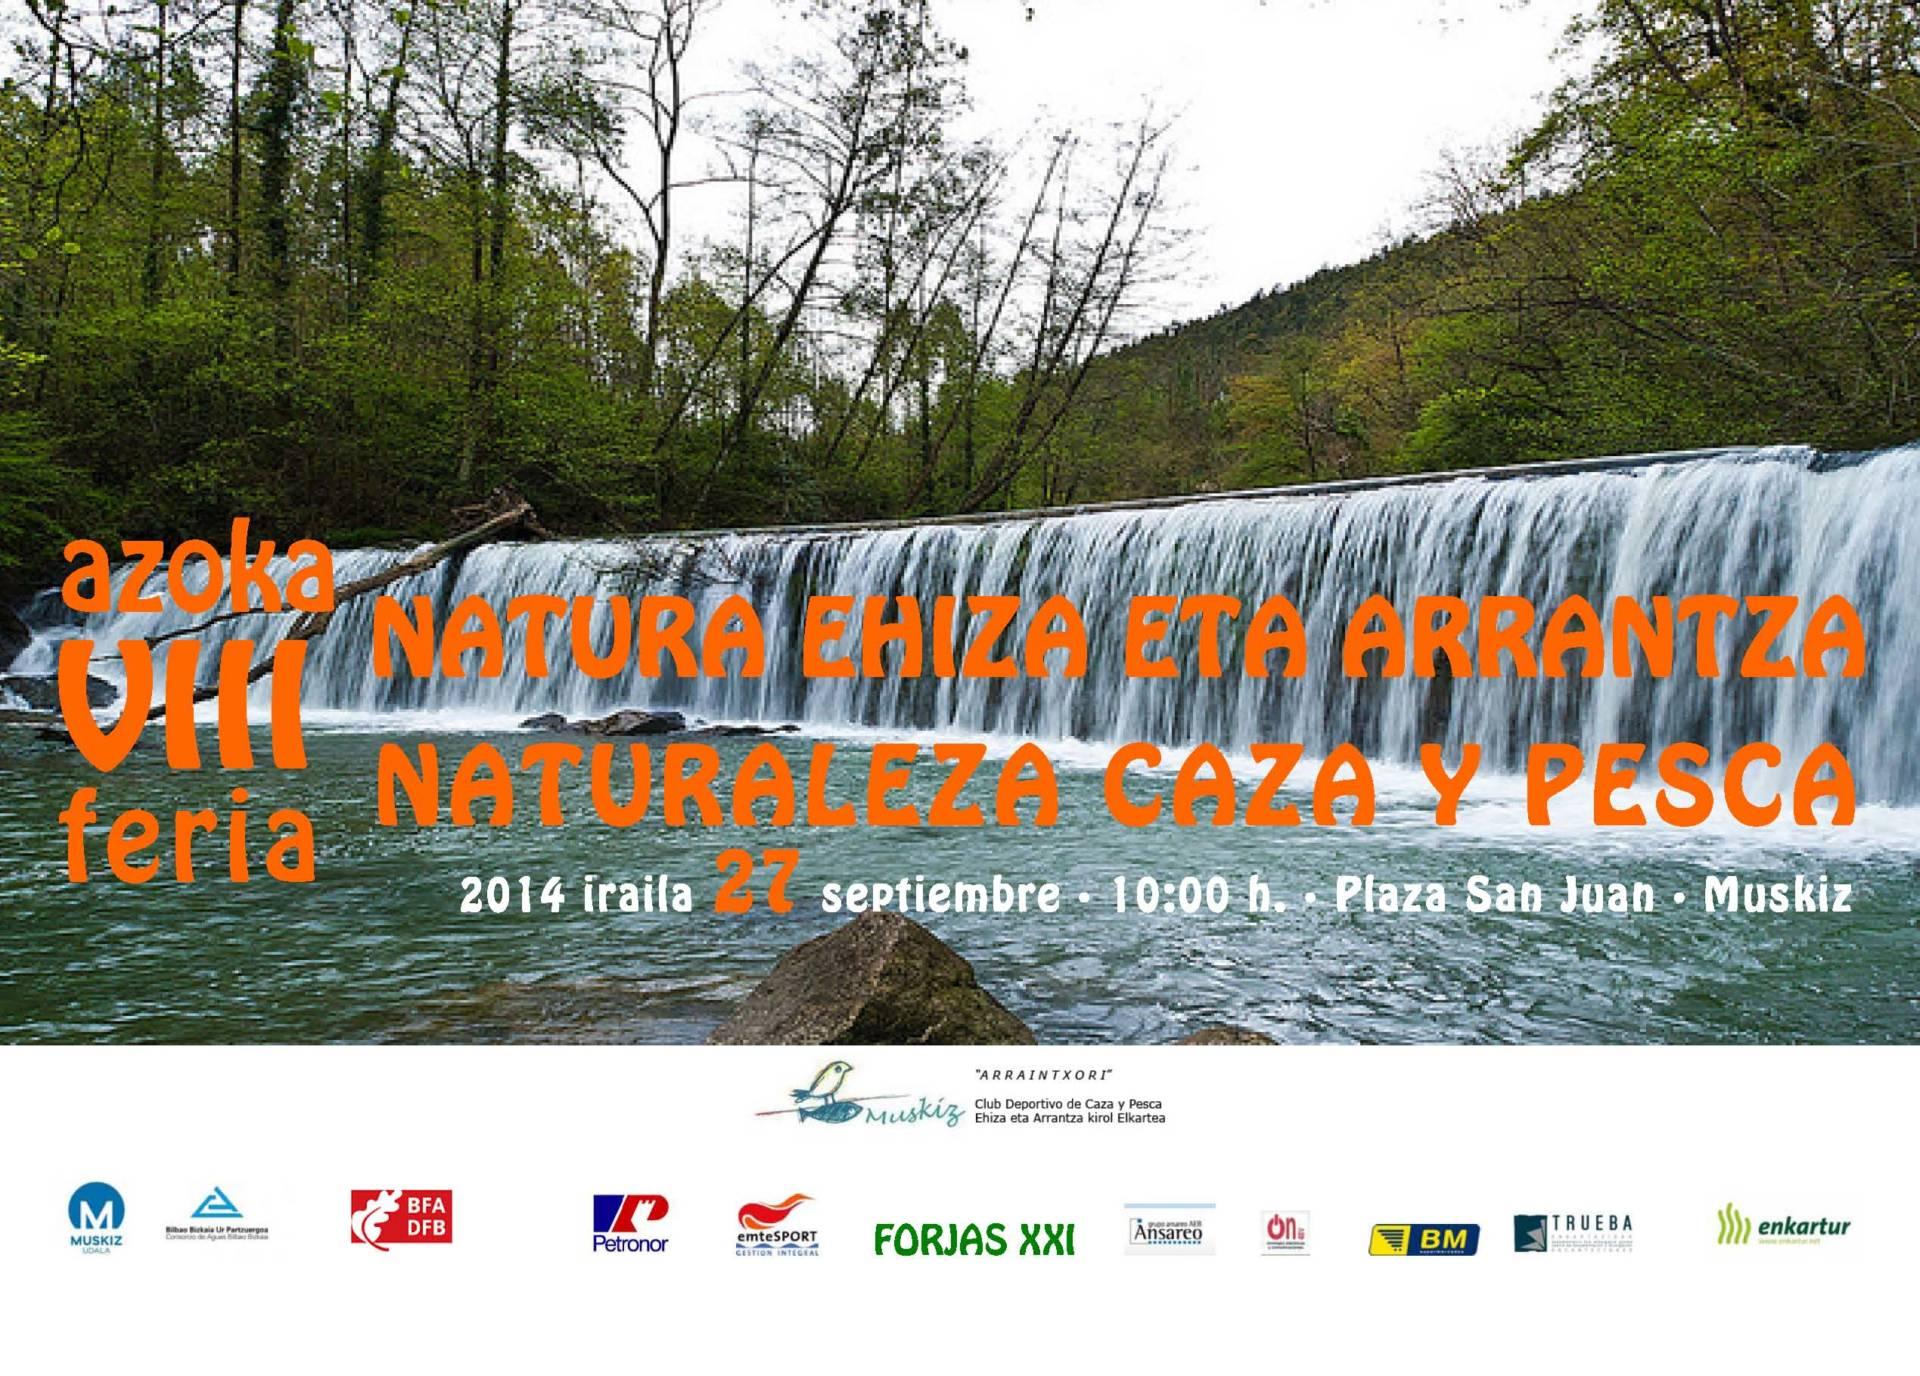 Este sábado se celebra en Muskiz la feria de caza, pesca y naturaleza.